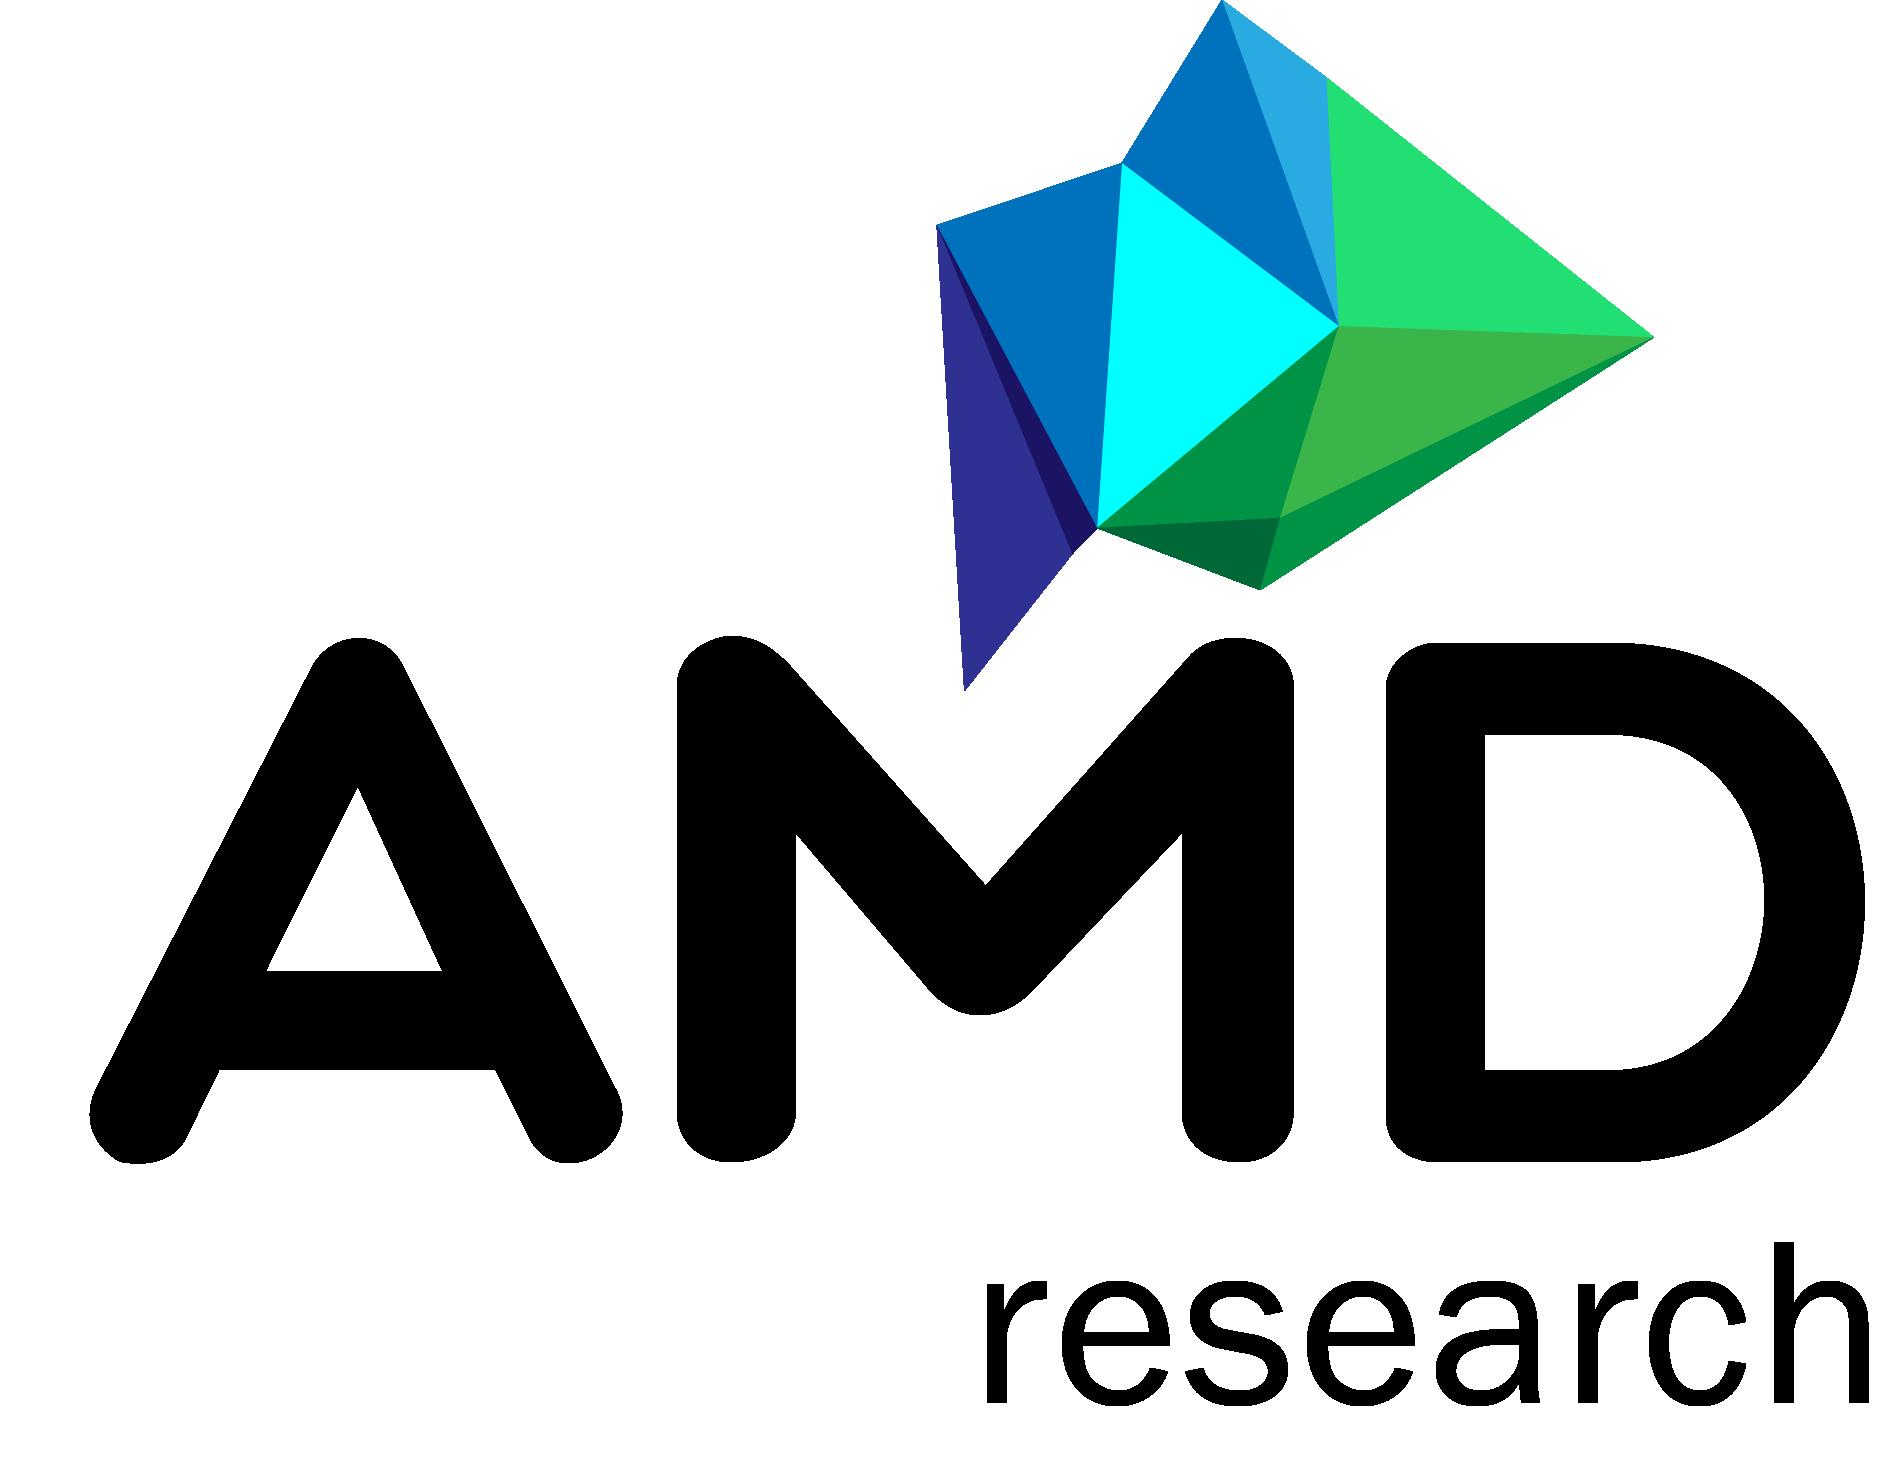 AMD Research Company Logo